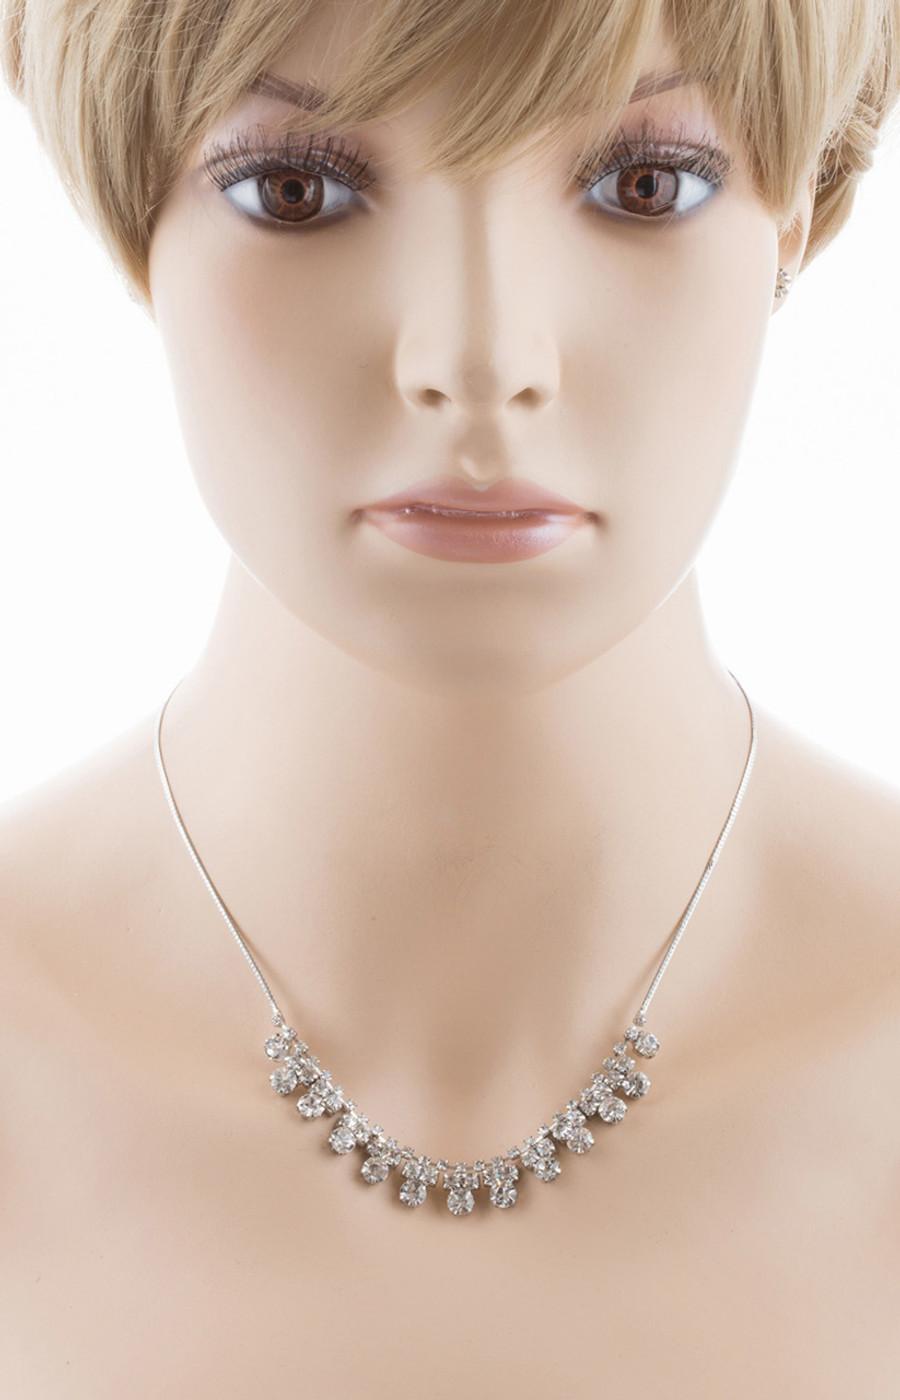 Bridal Wedding Jewelry Set Crystal Rhinestone Simple Classic Linear Bib Necklace